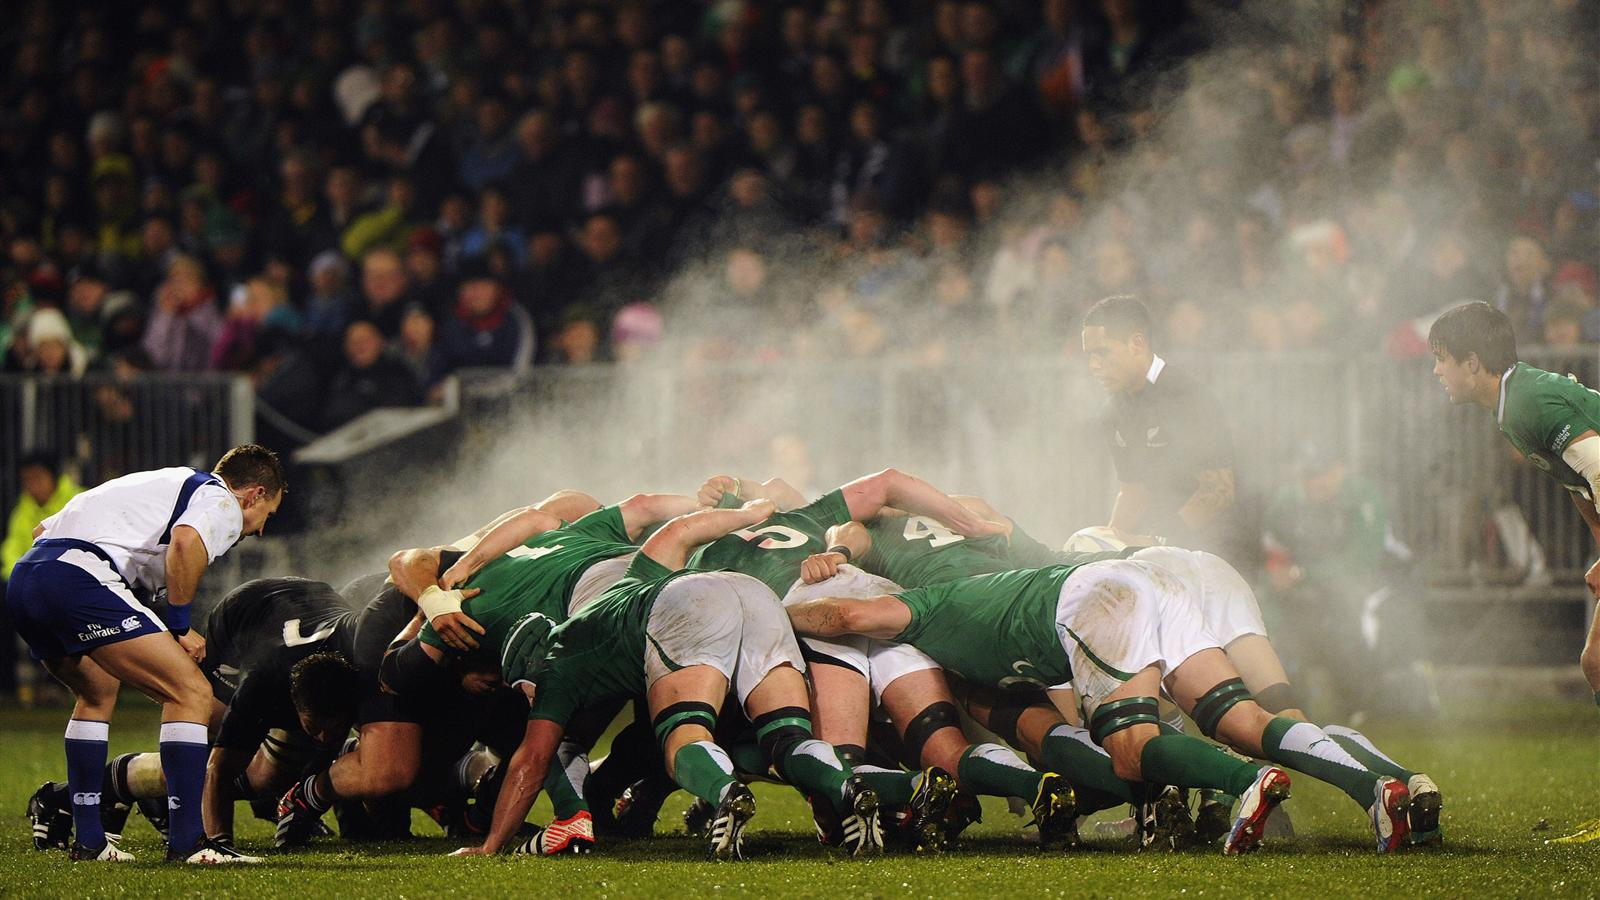 All Blacks deny Ireland - Rugby - Eurosport Australia